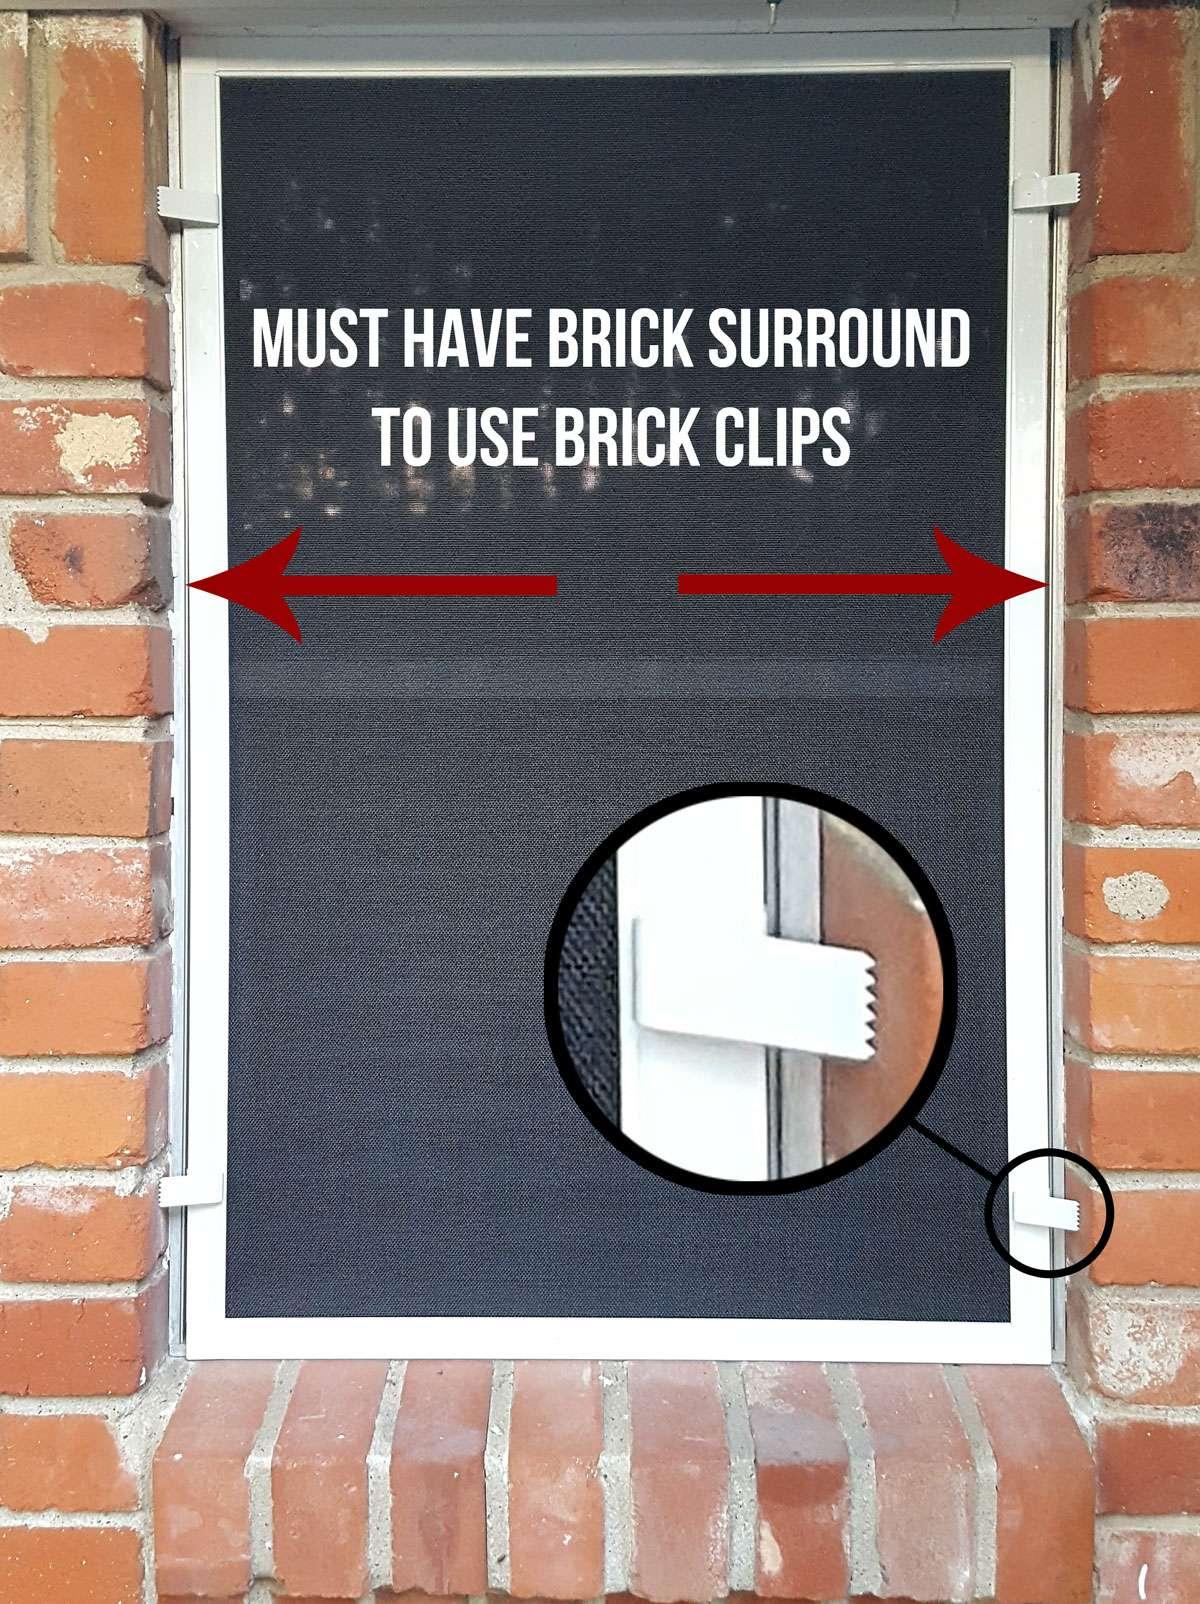 using brick clips